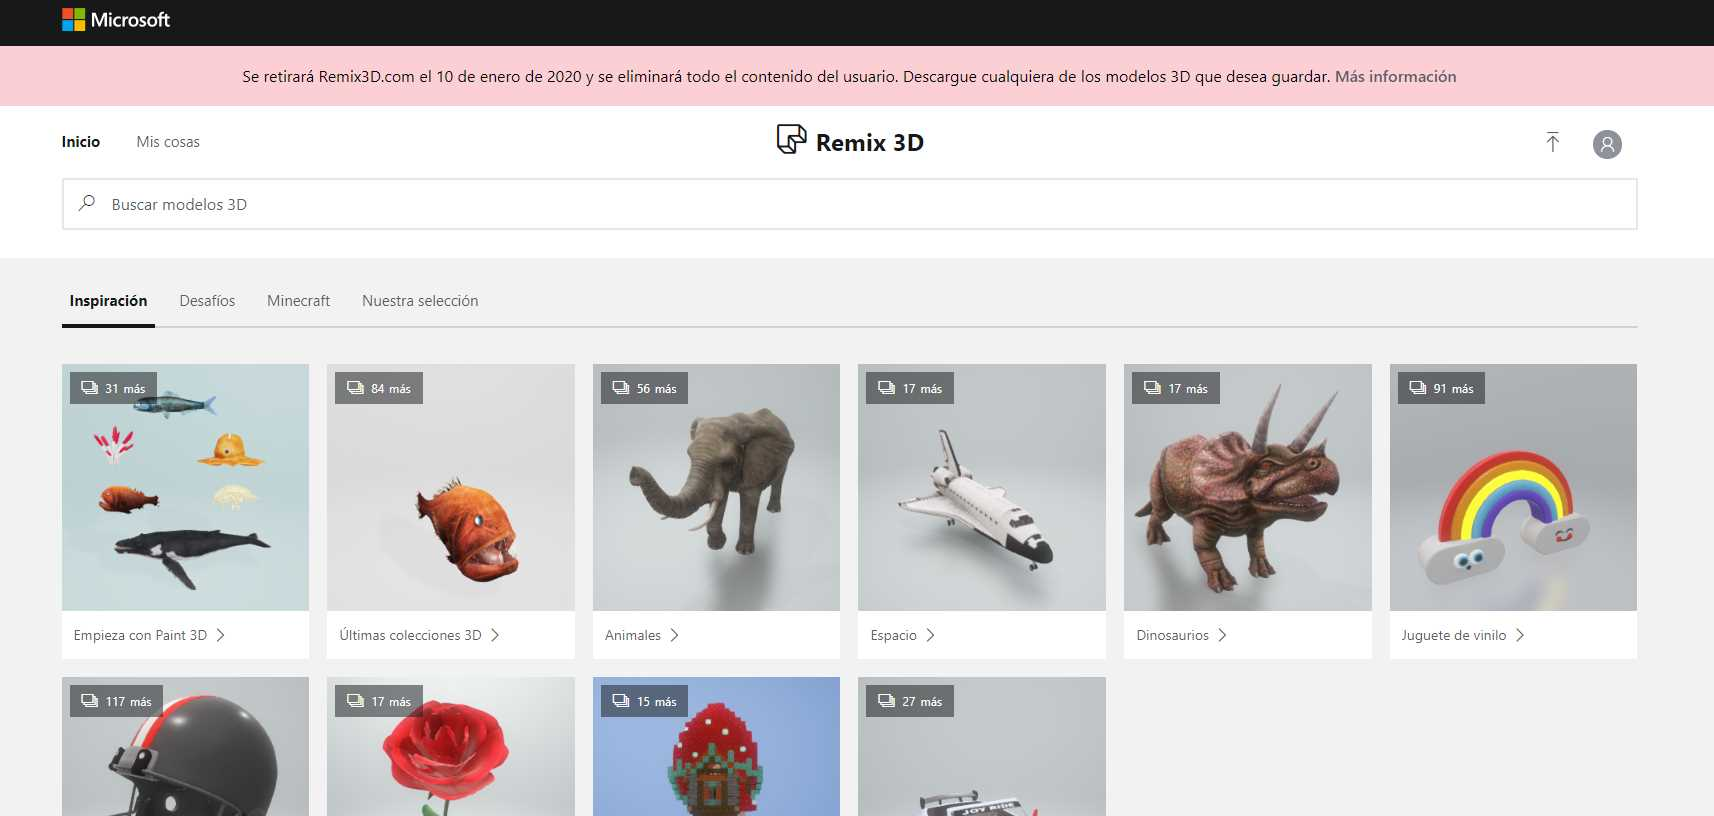 Microsoft eliminará Remix 3D, su plataforma para compartir modelos 3D